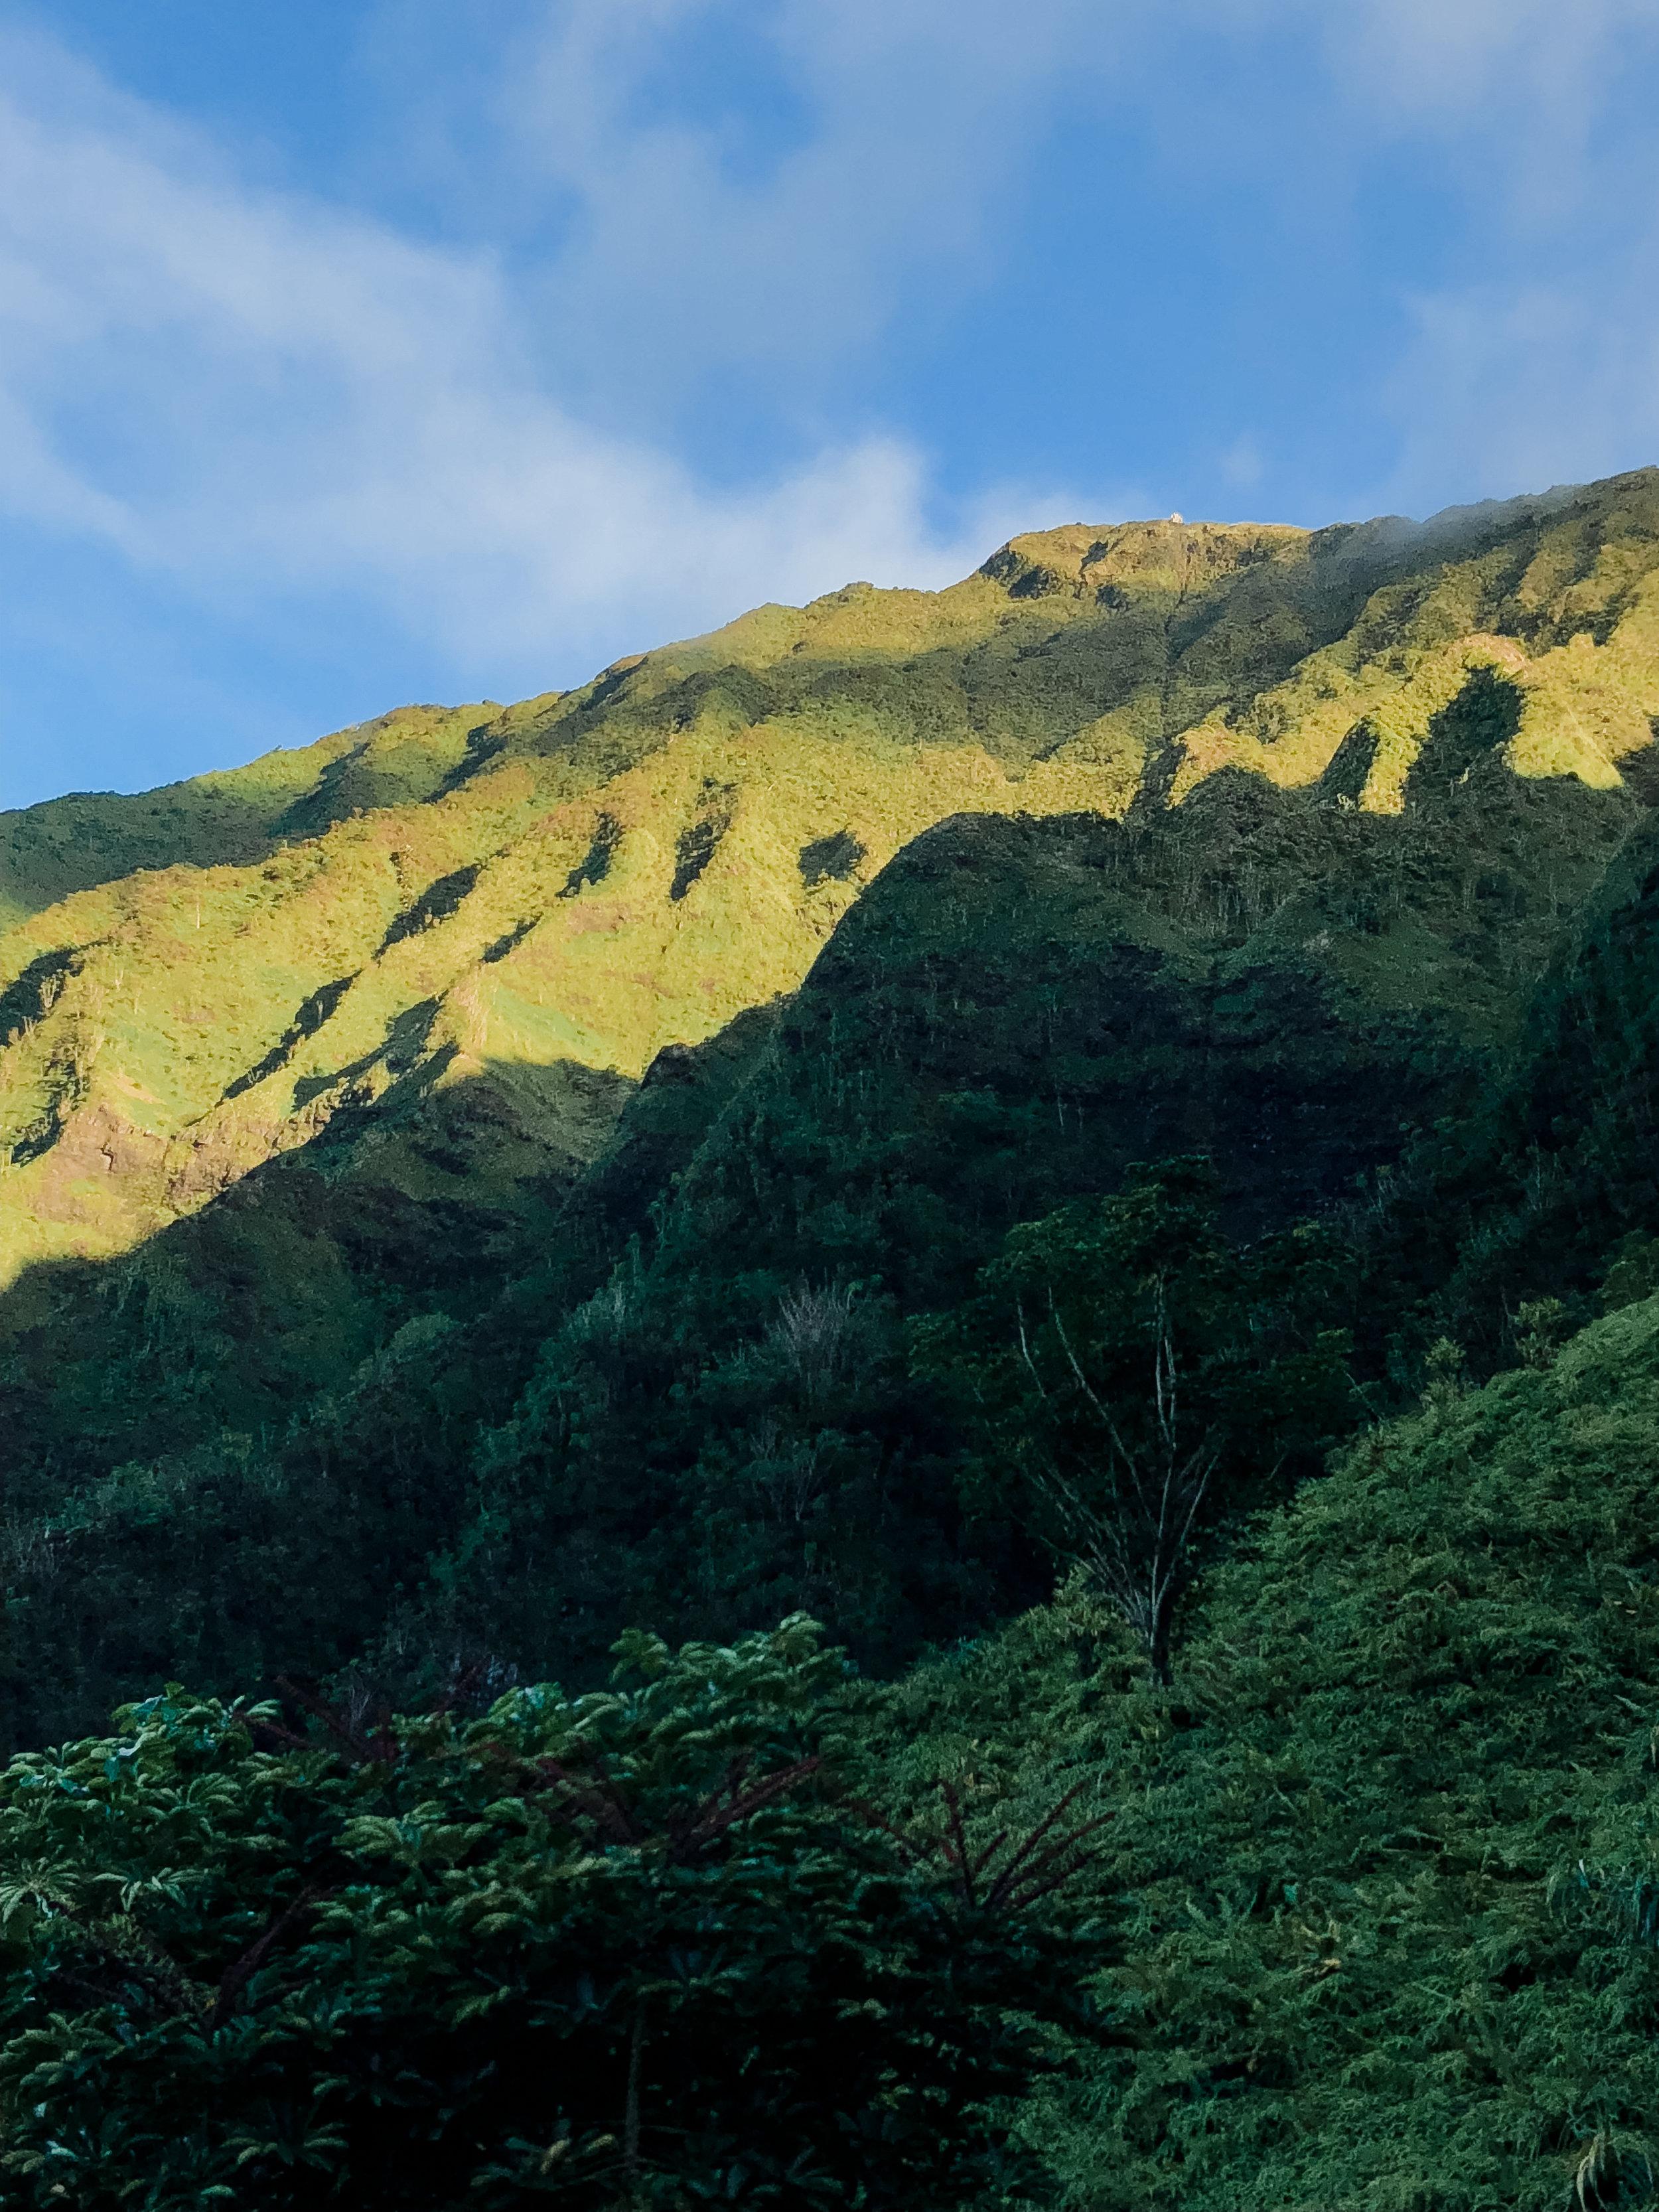 meagans hawaii pics-42.jpg